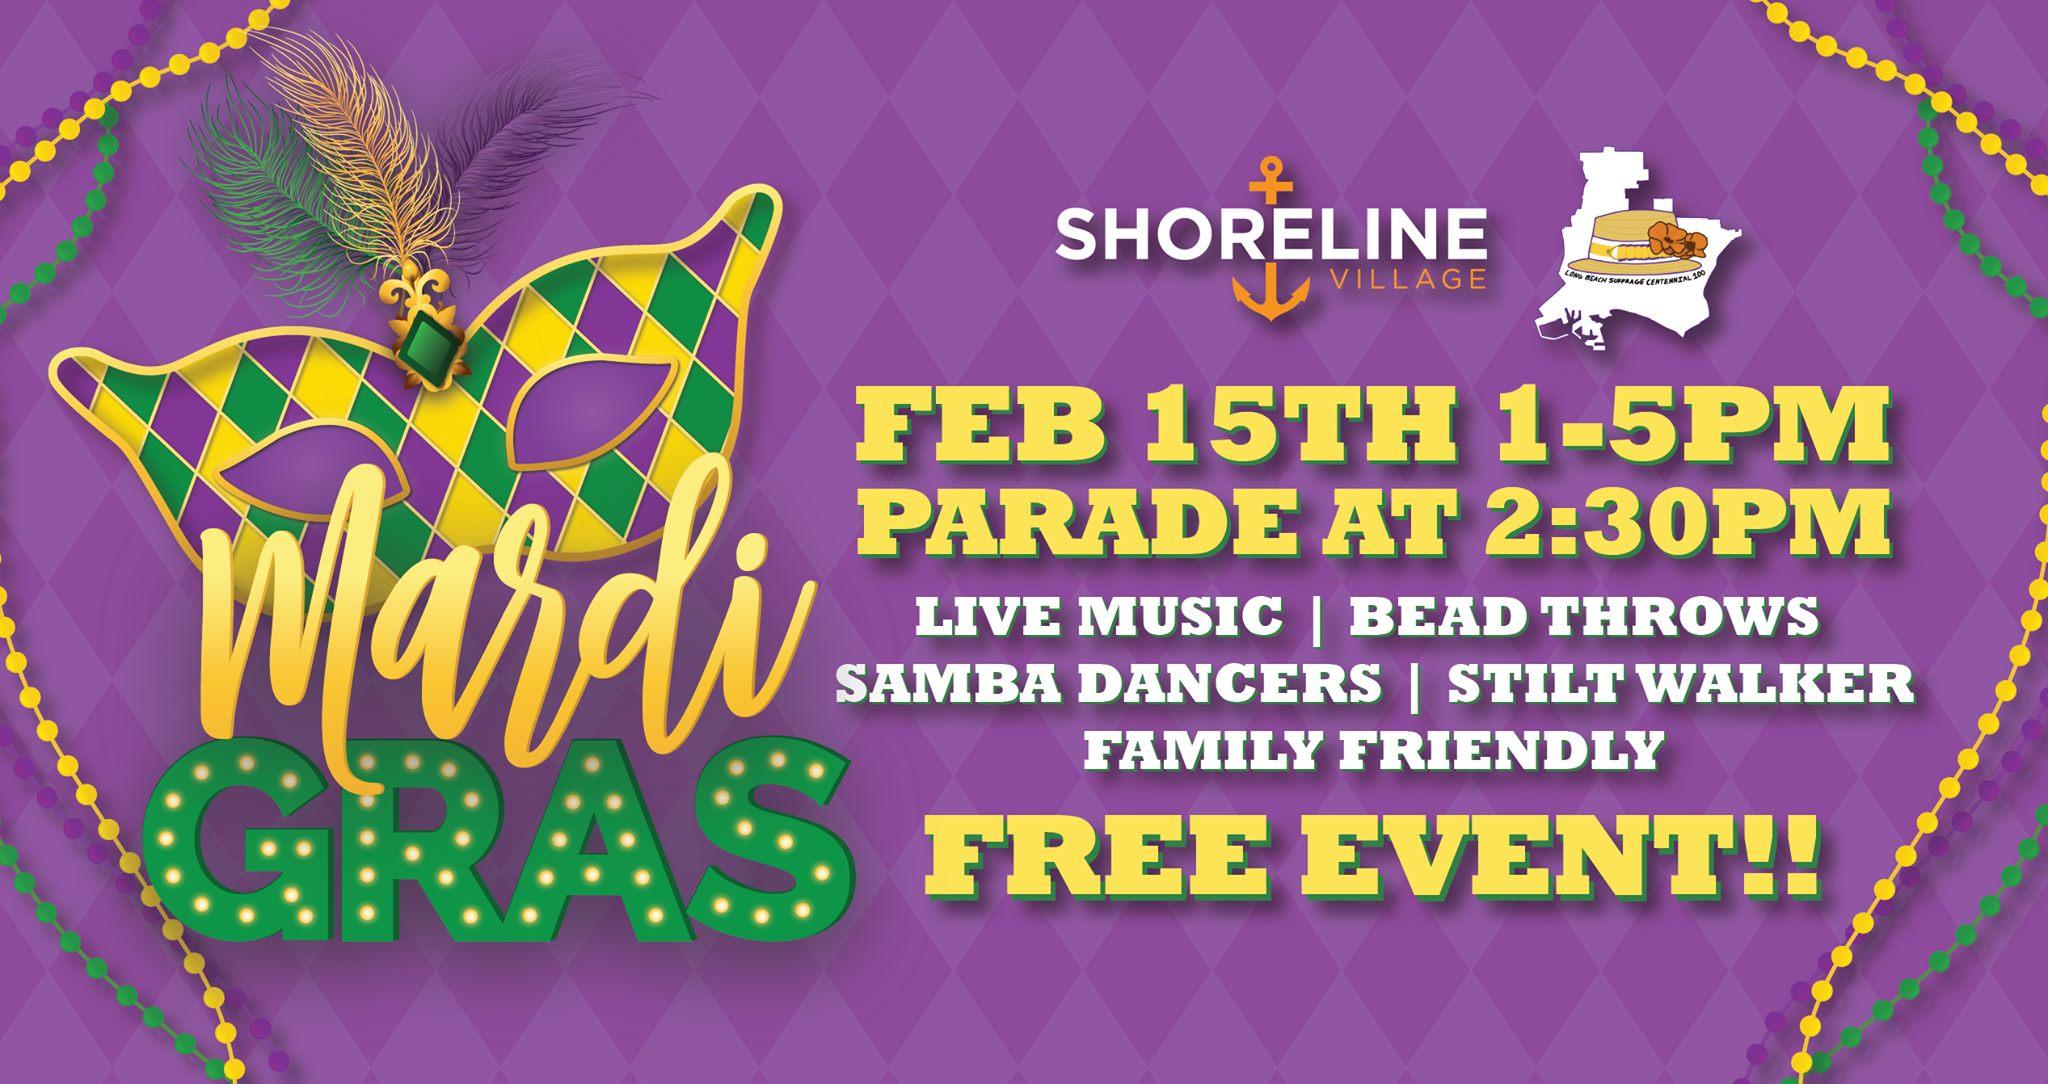 Long Beach Mardi Gras at Shoreline Village